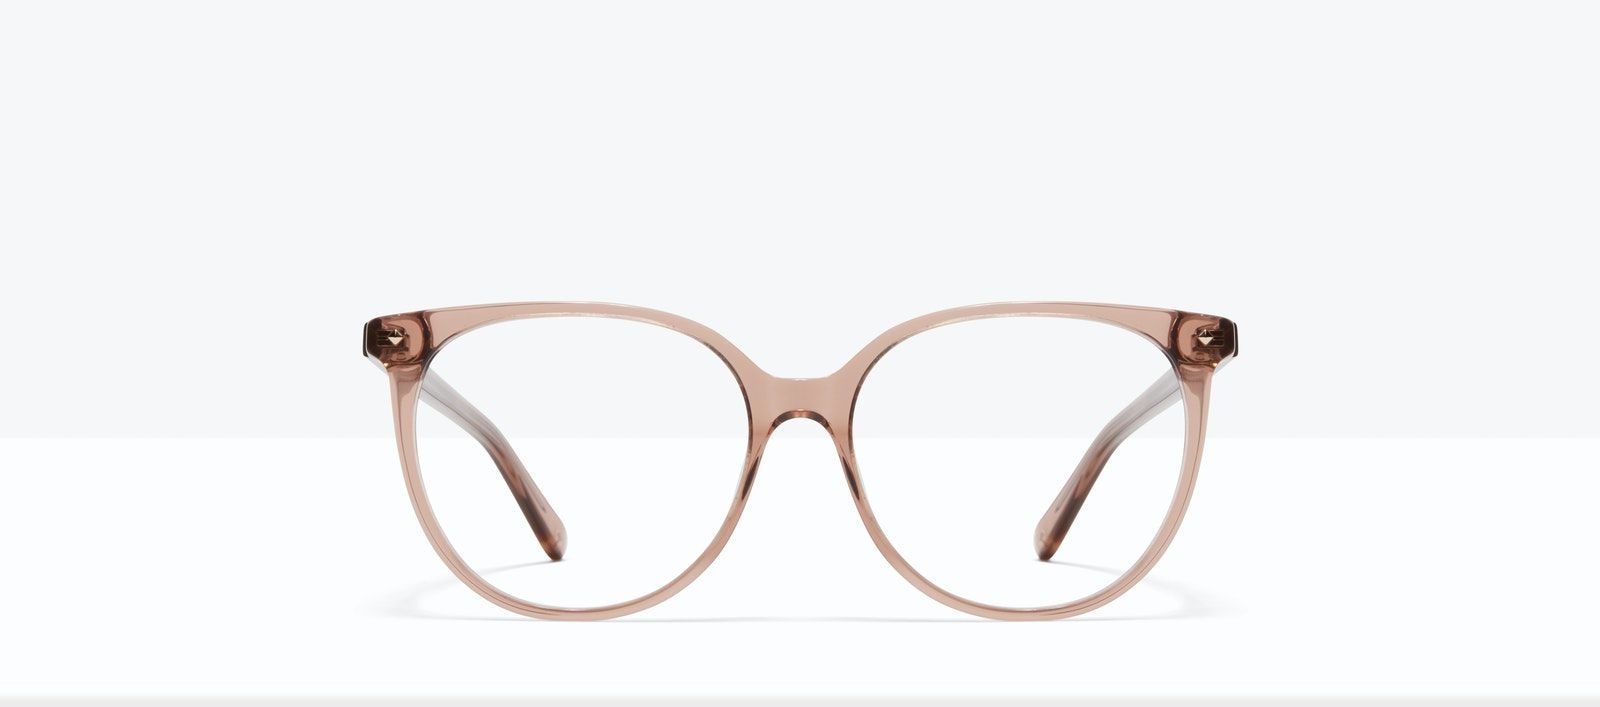 Affordable Fashion Glasses Round Eyeglasses Women Area L Rose Front